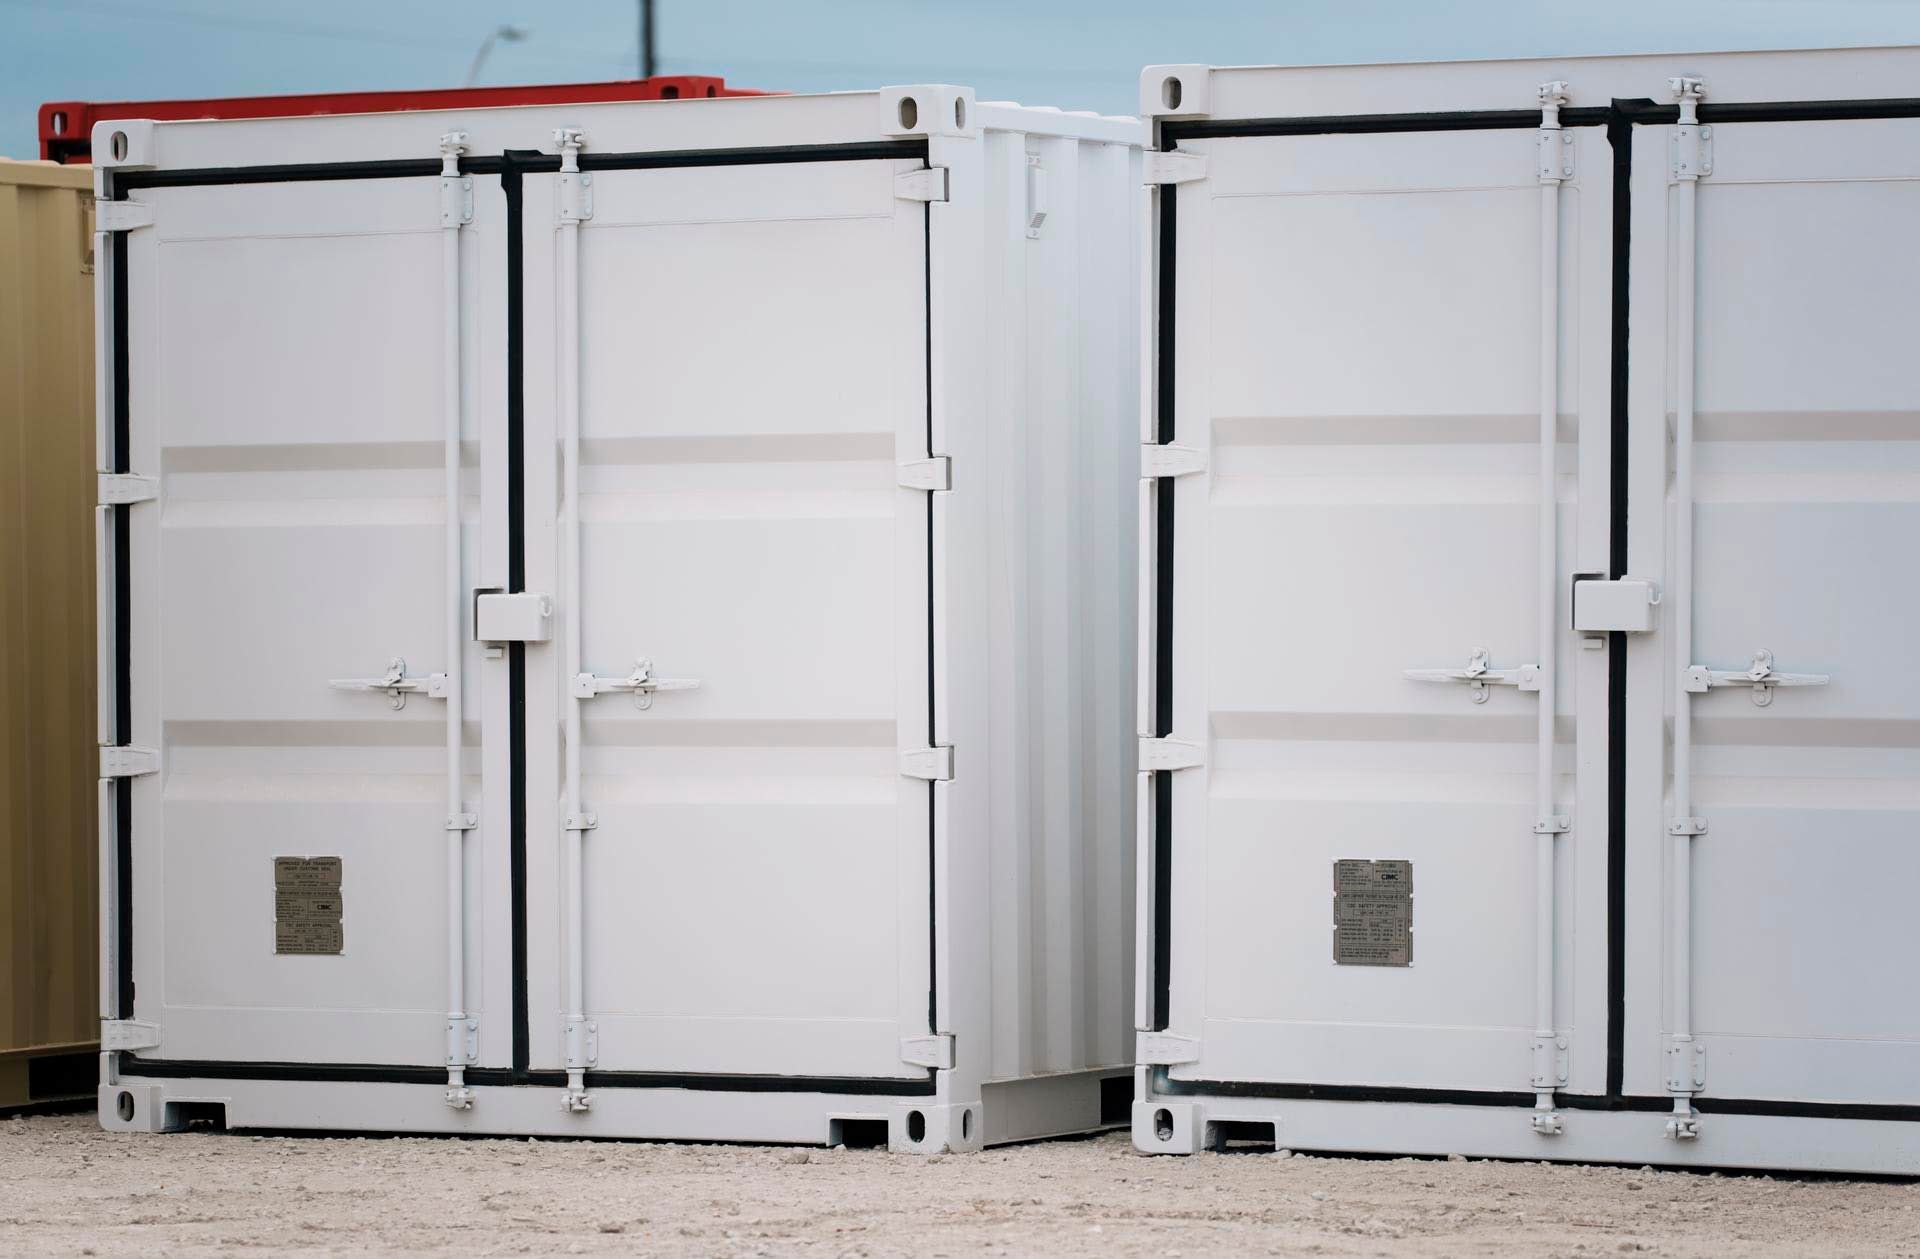 falcon_dual_storage_container_floor_plan